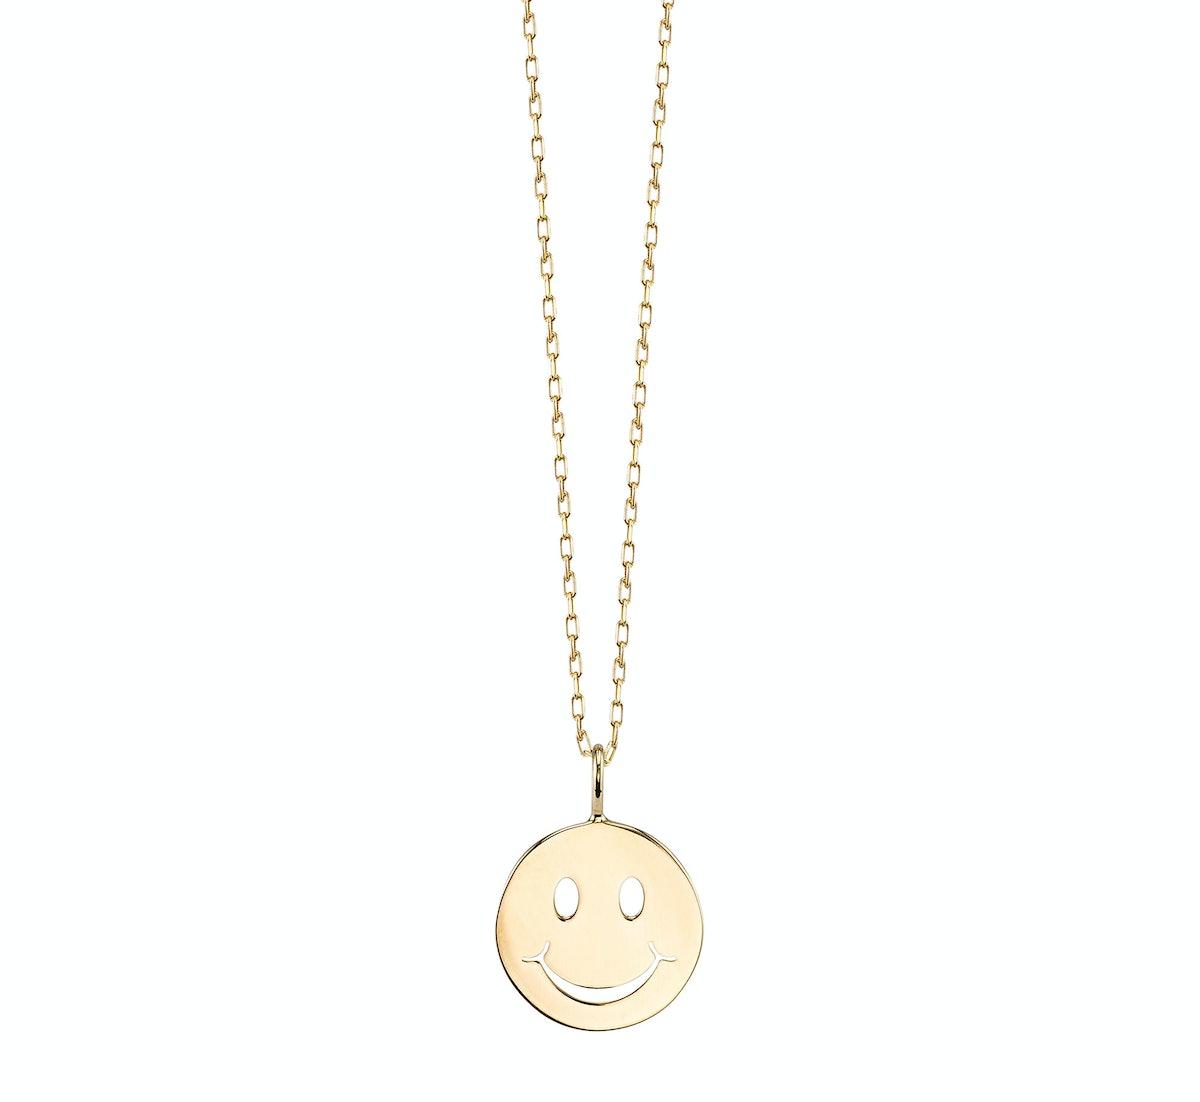 Sydney Evan 14k yellow gold necklace